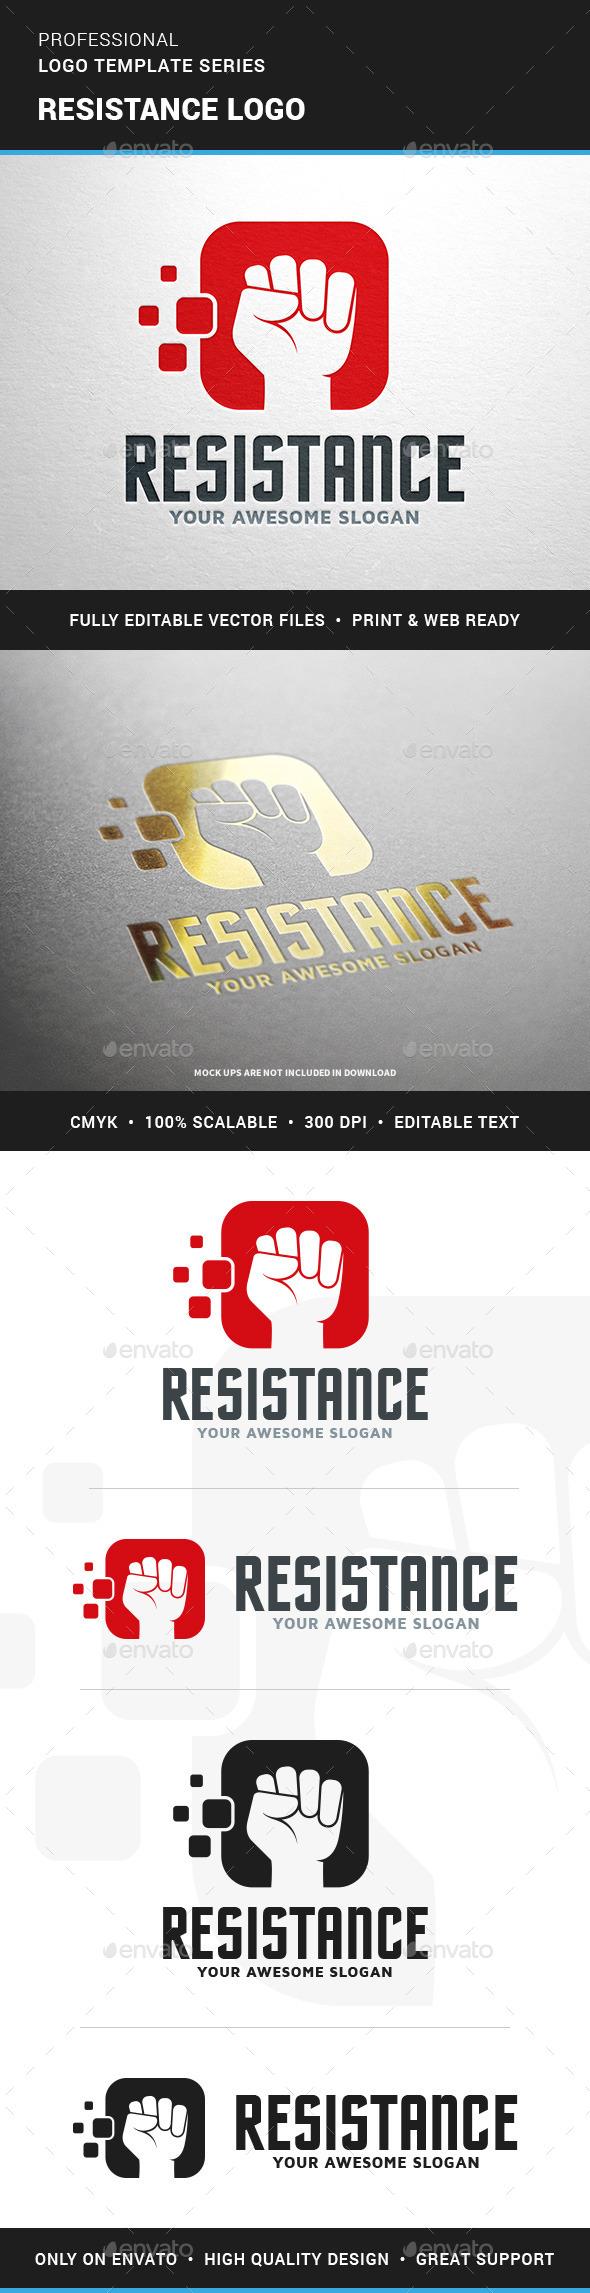 Resistance Logo Template